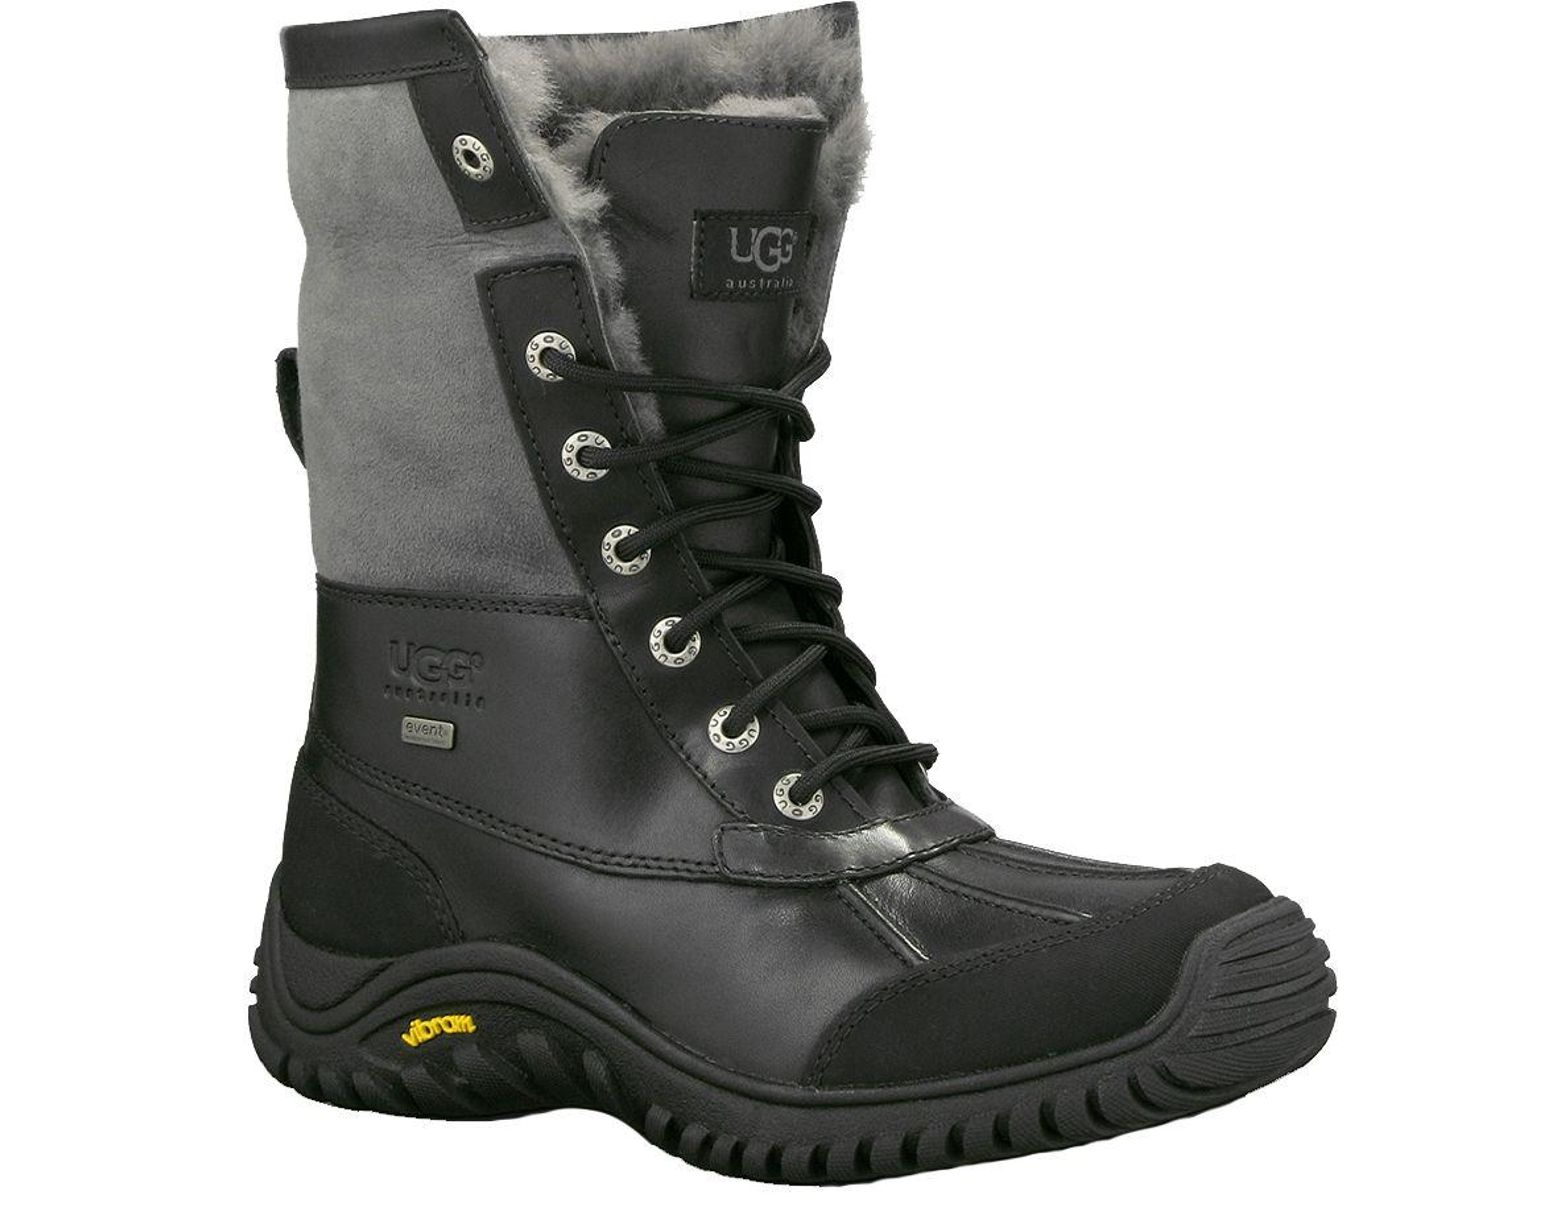 d934612abd2 Women's Black Australia Adirondack Ii Winter Boots